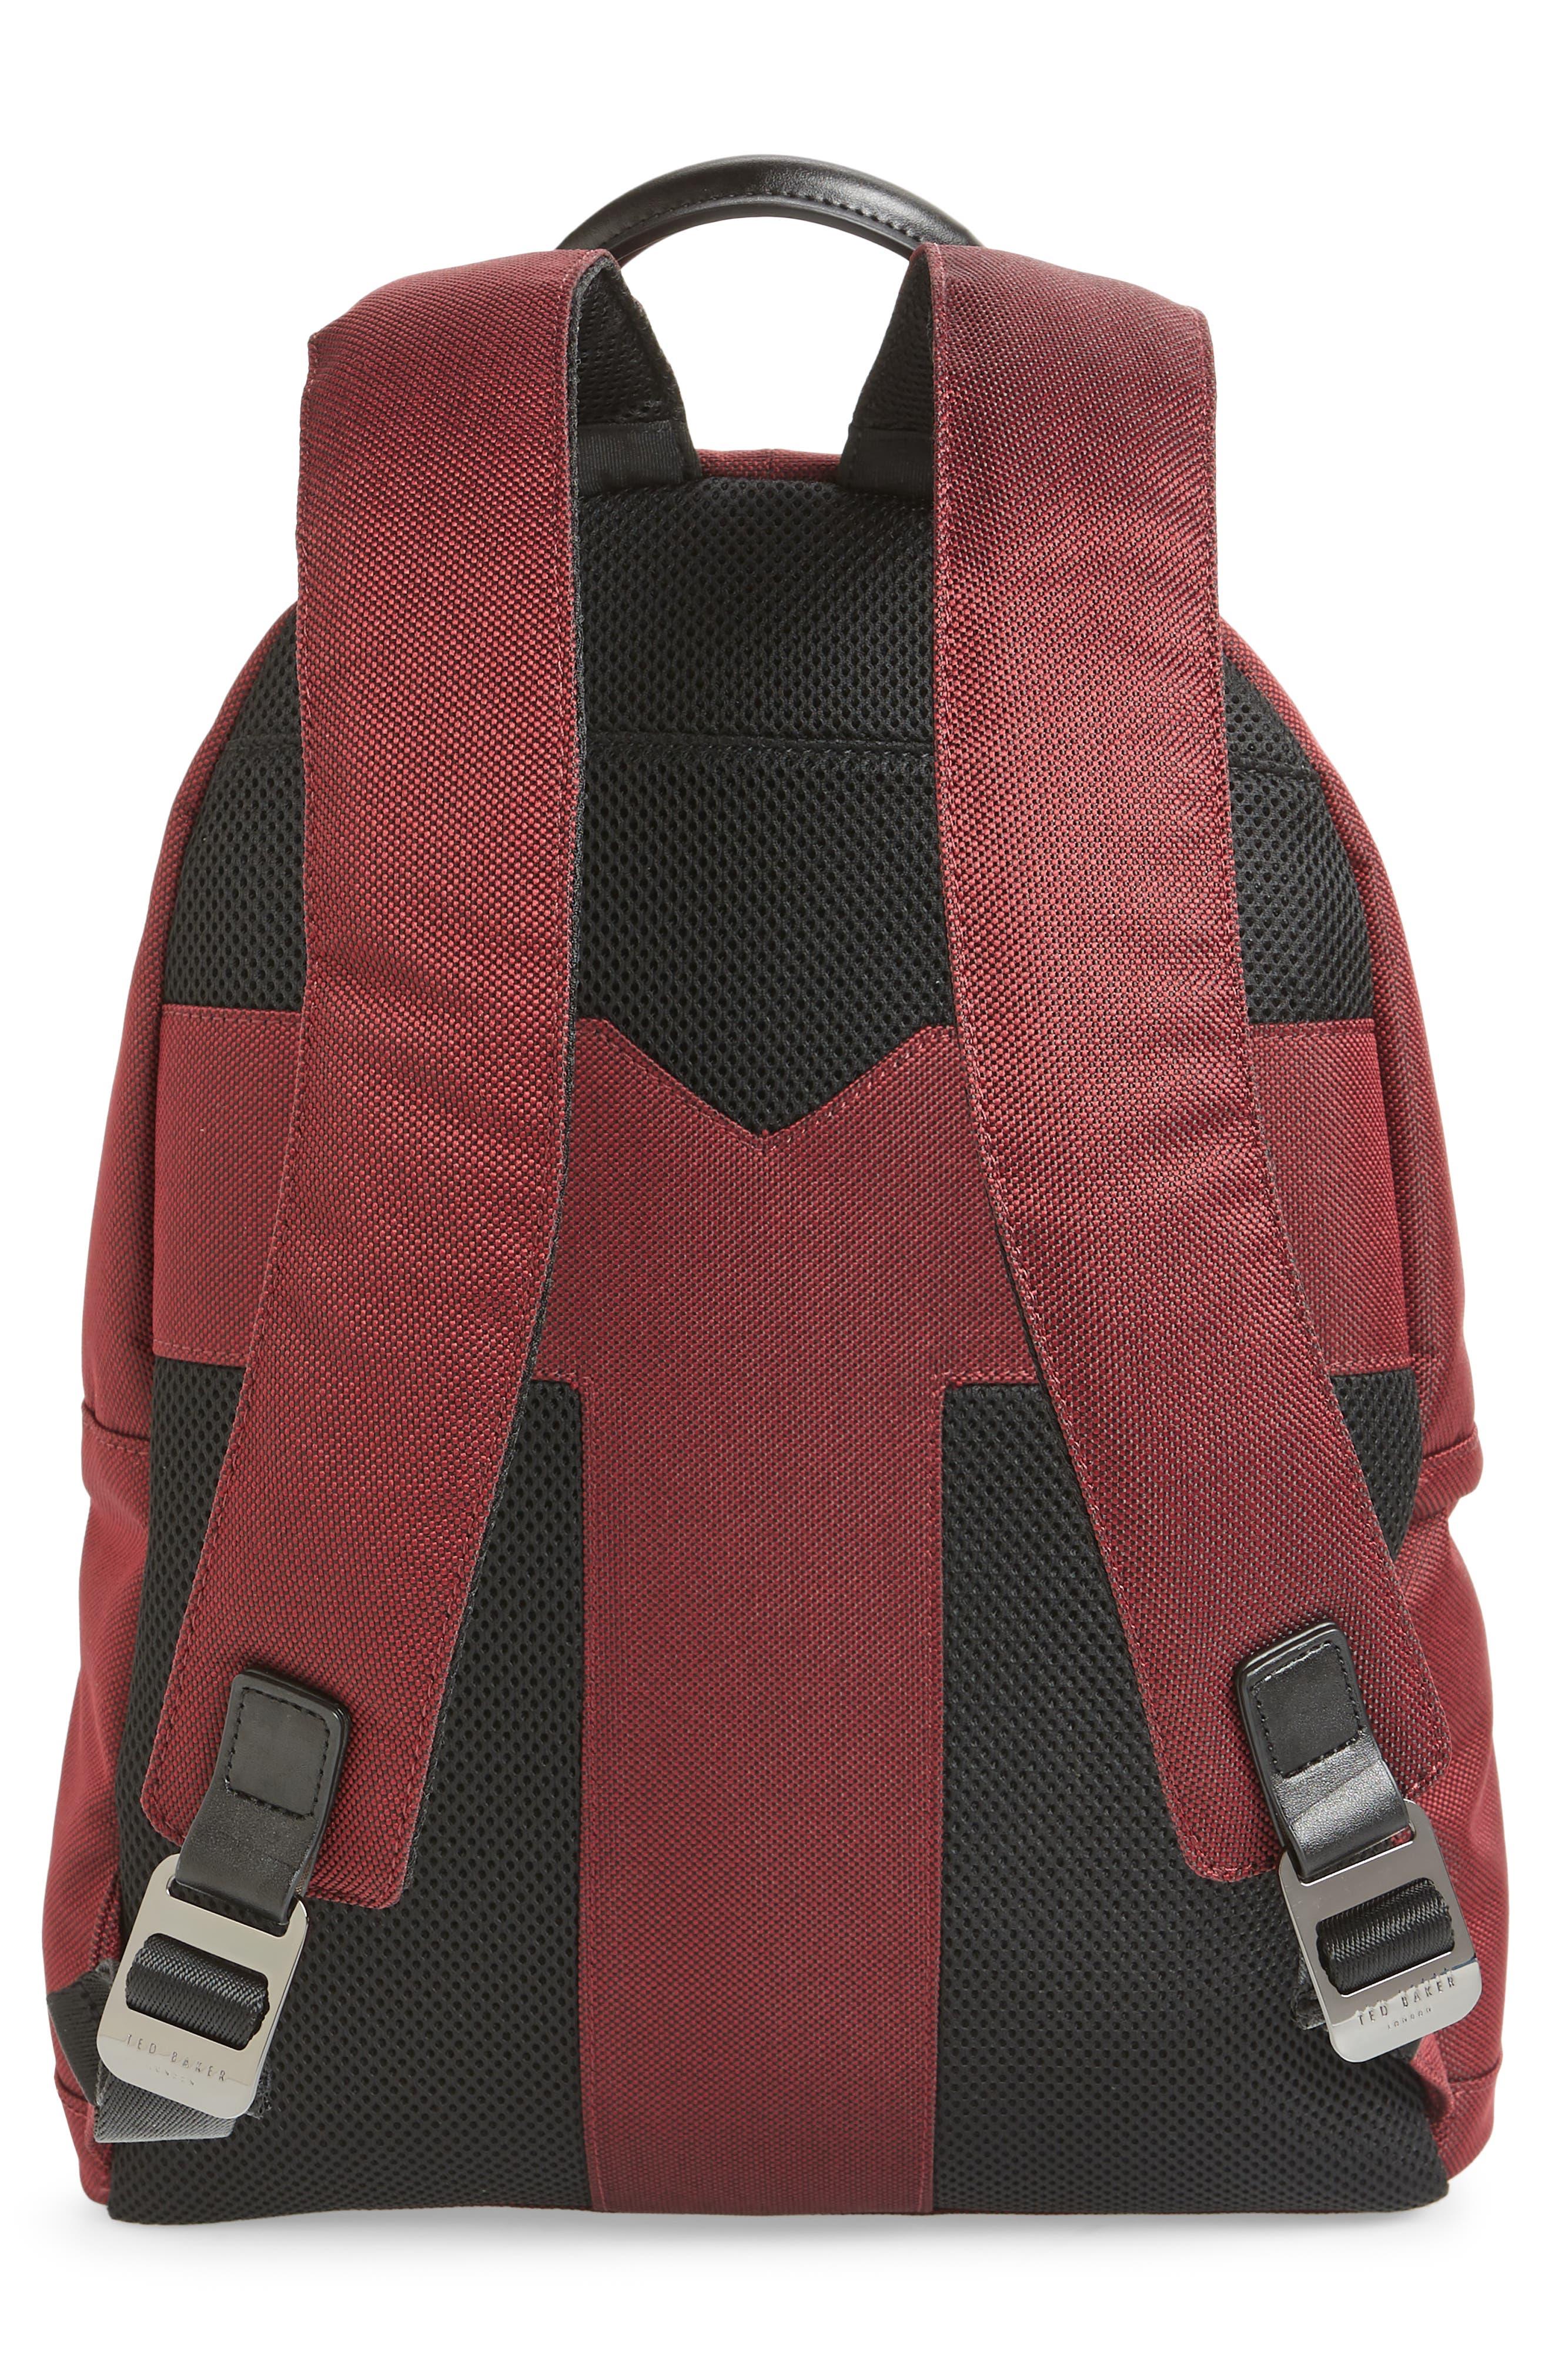 Filer Backpack,                             Alternate thumbnail 3, color,                             RED